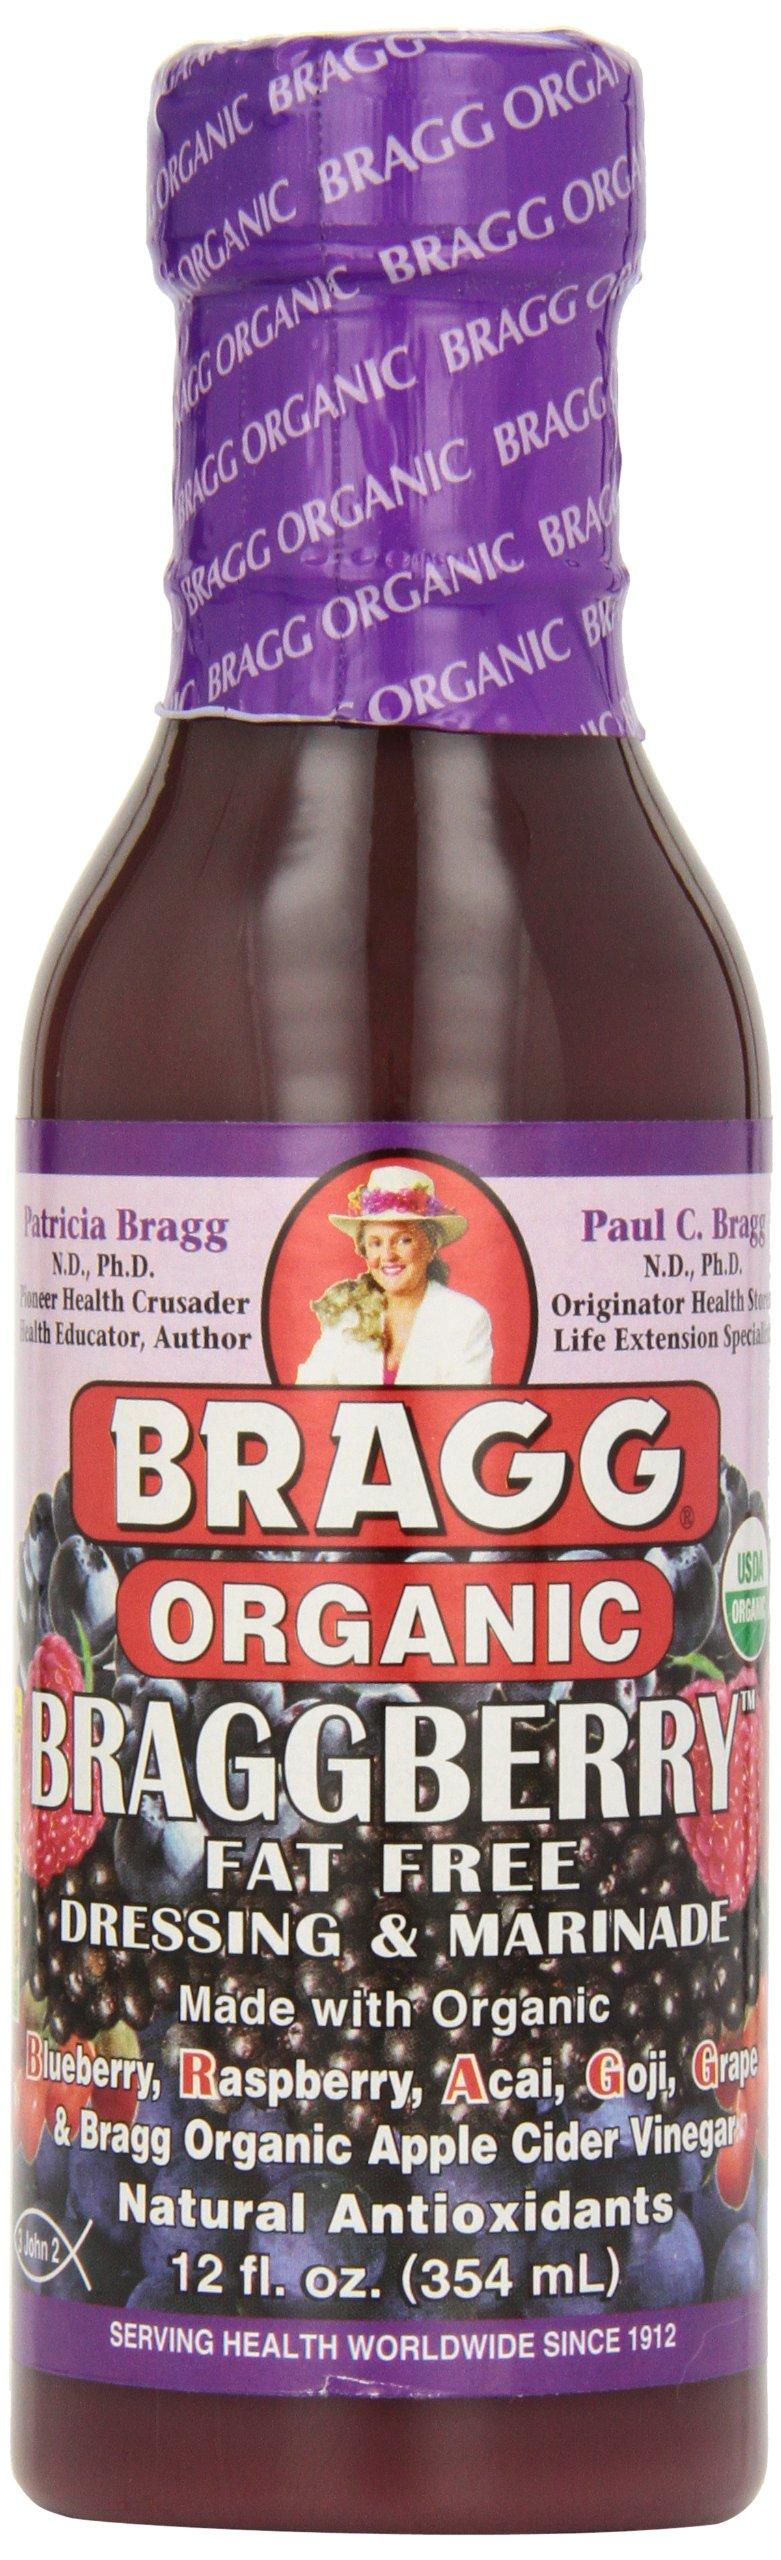 Bragg Organic Braggberry Fat Free Dressing & Marinade